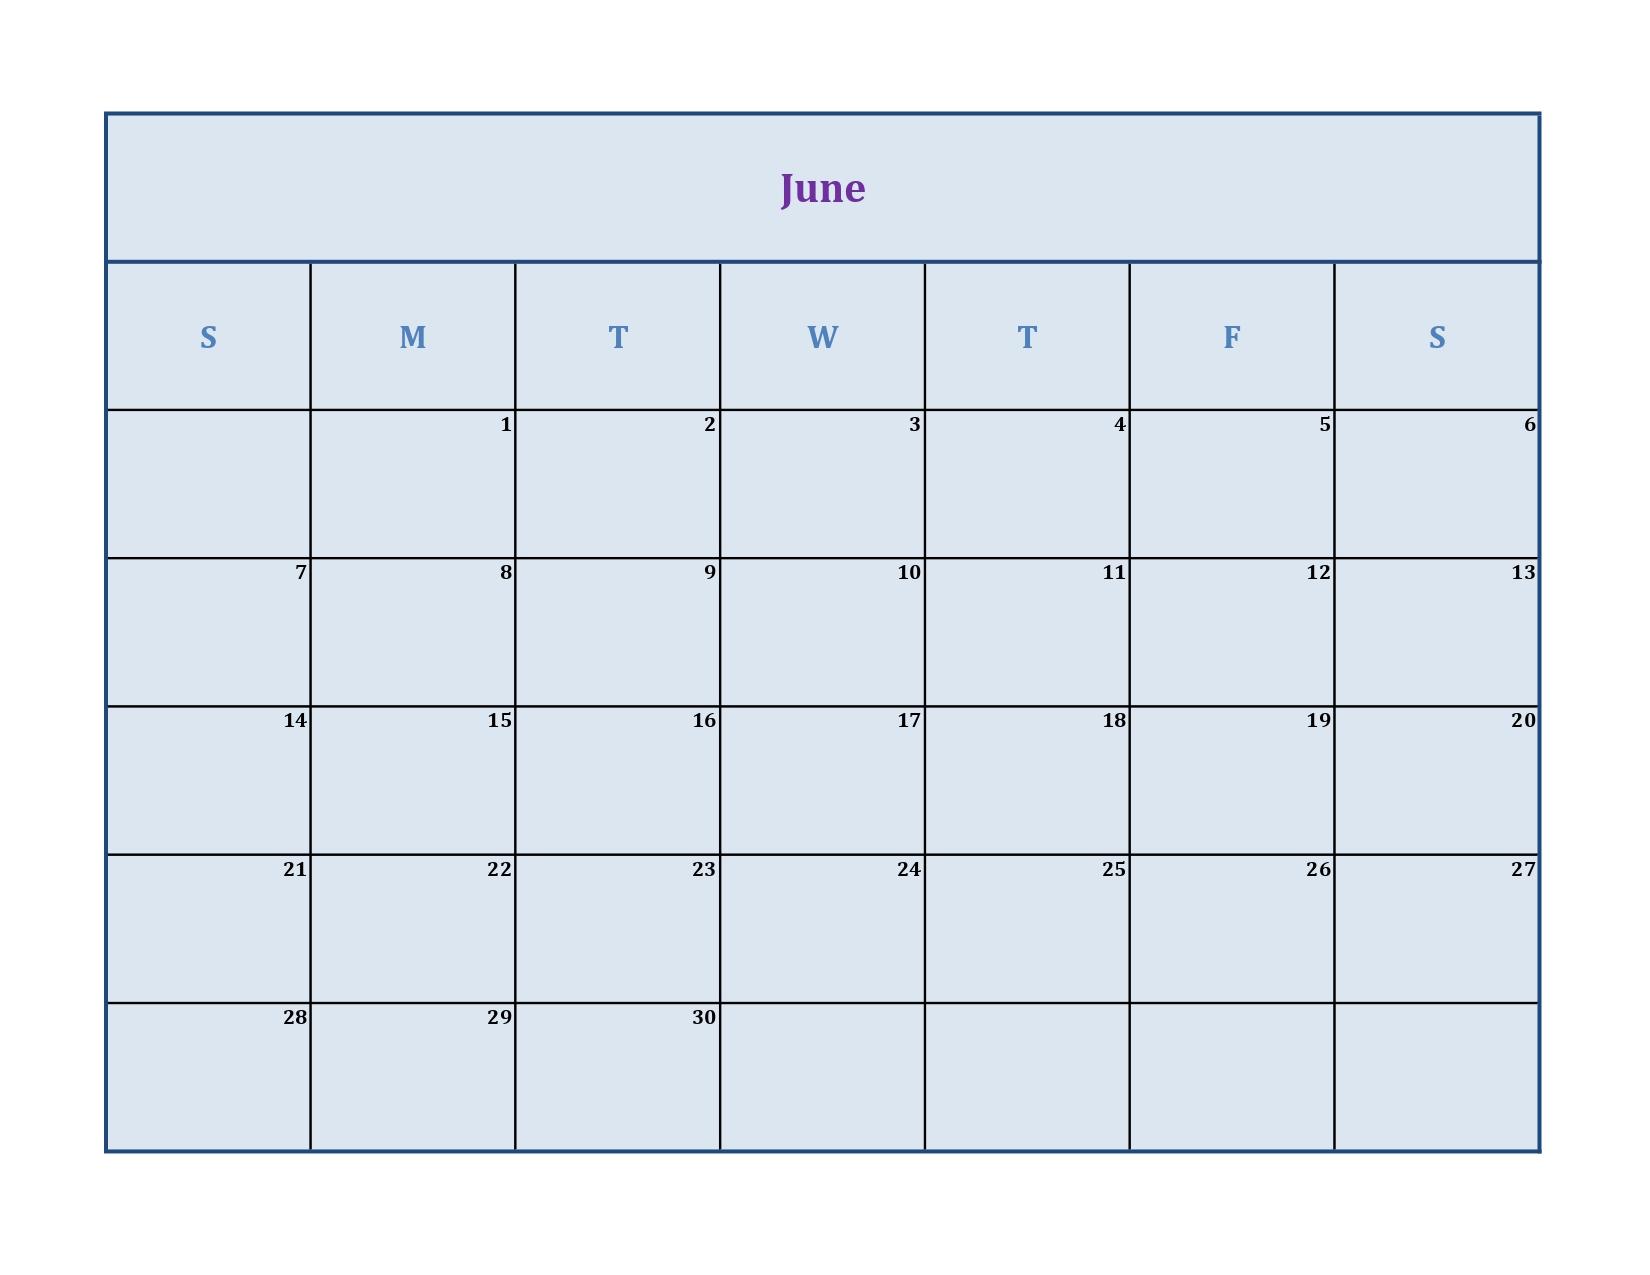 June 2020 calendar without holidays